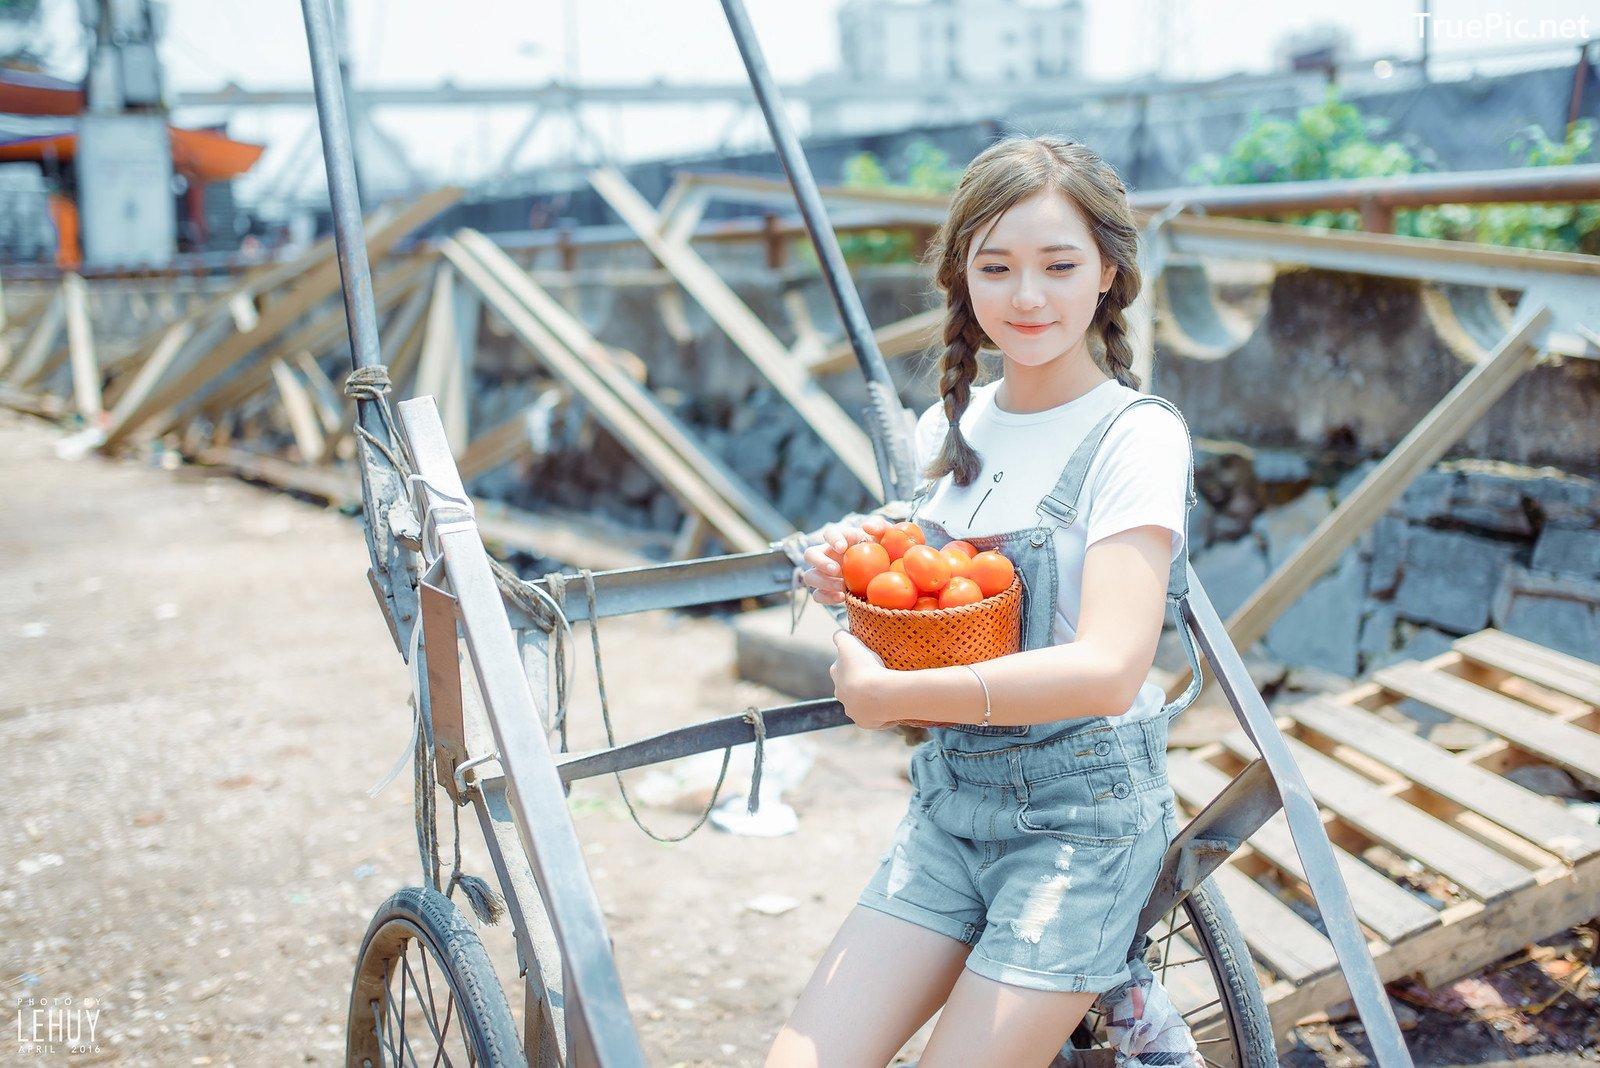 Image-Vietnamese-Hot-Girl-Photo-Album-Tomato-Little-Girl-Cute-TruePic.net- Picture-4